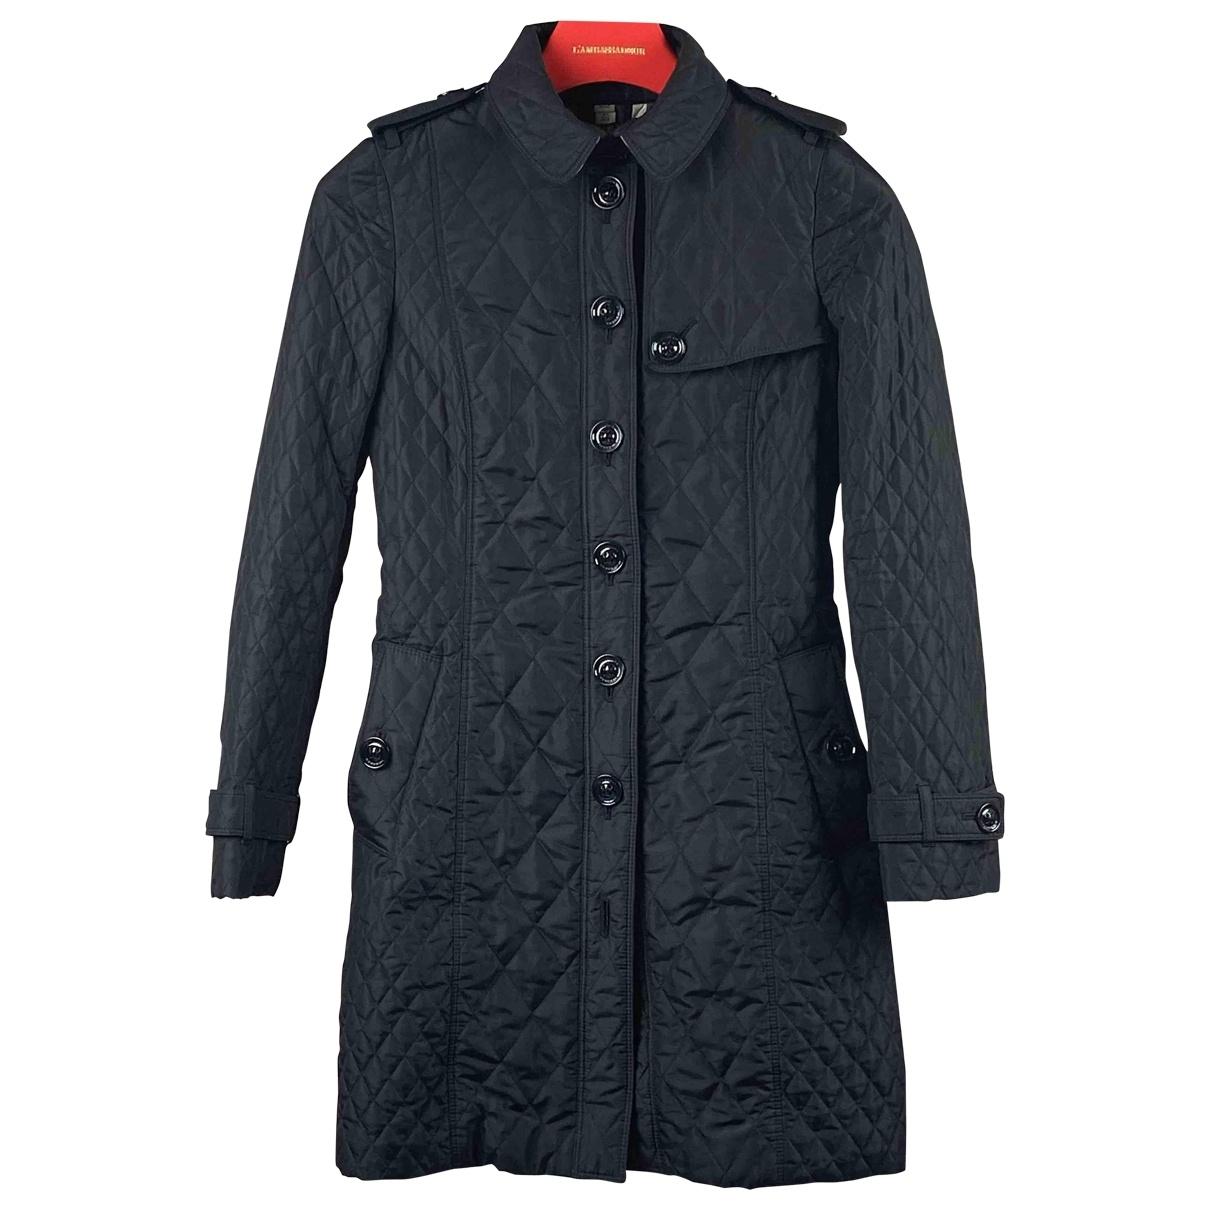 Burberry \N Black coat for Women 36 IT